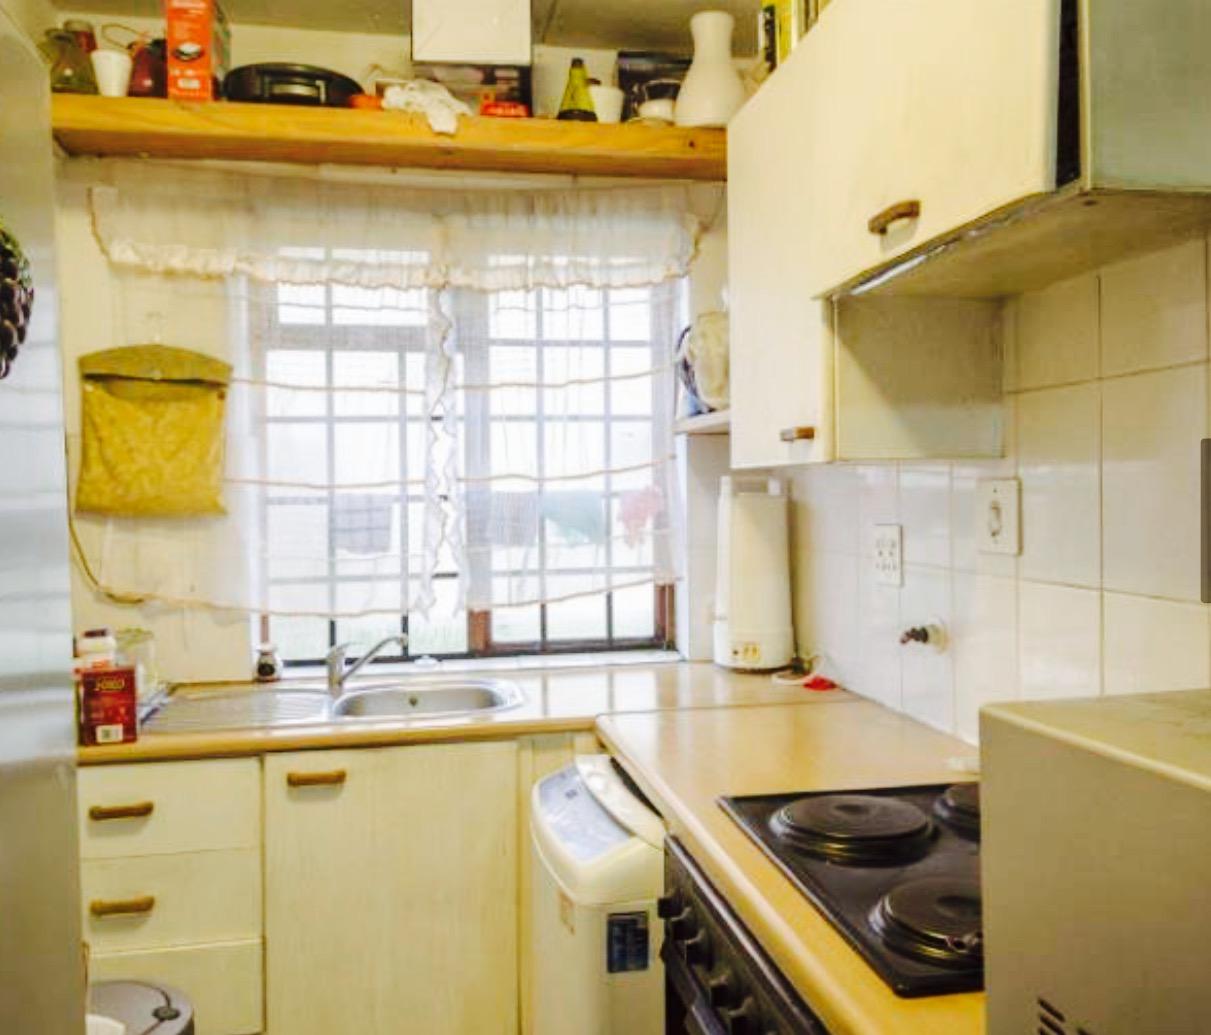 2 BedroomApartment For Sale In Onverwacht